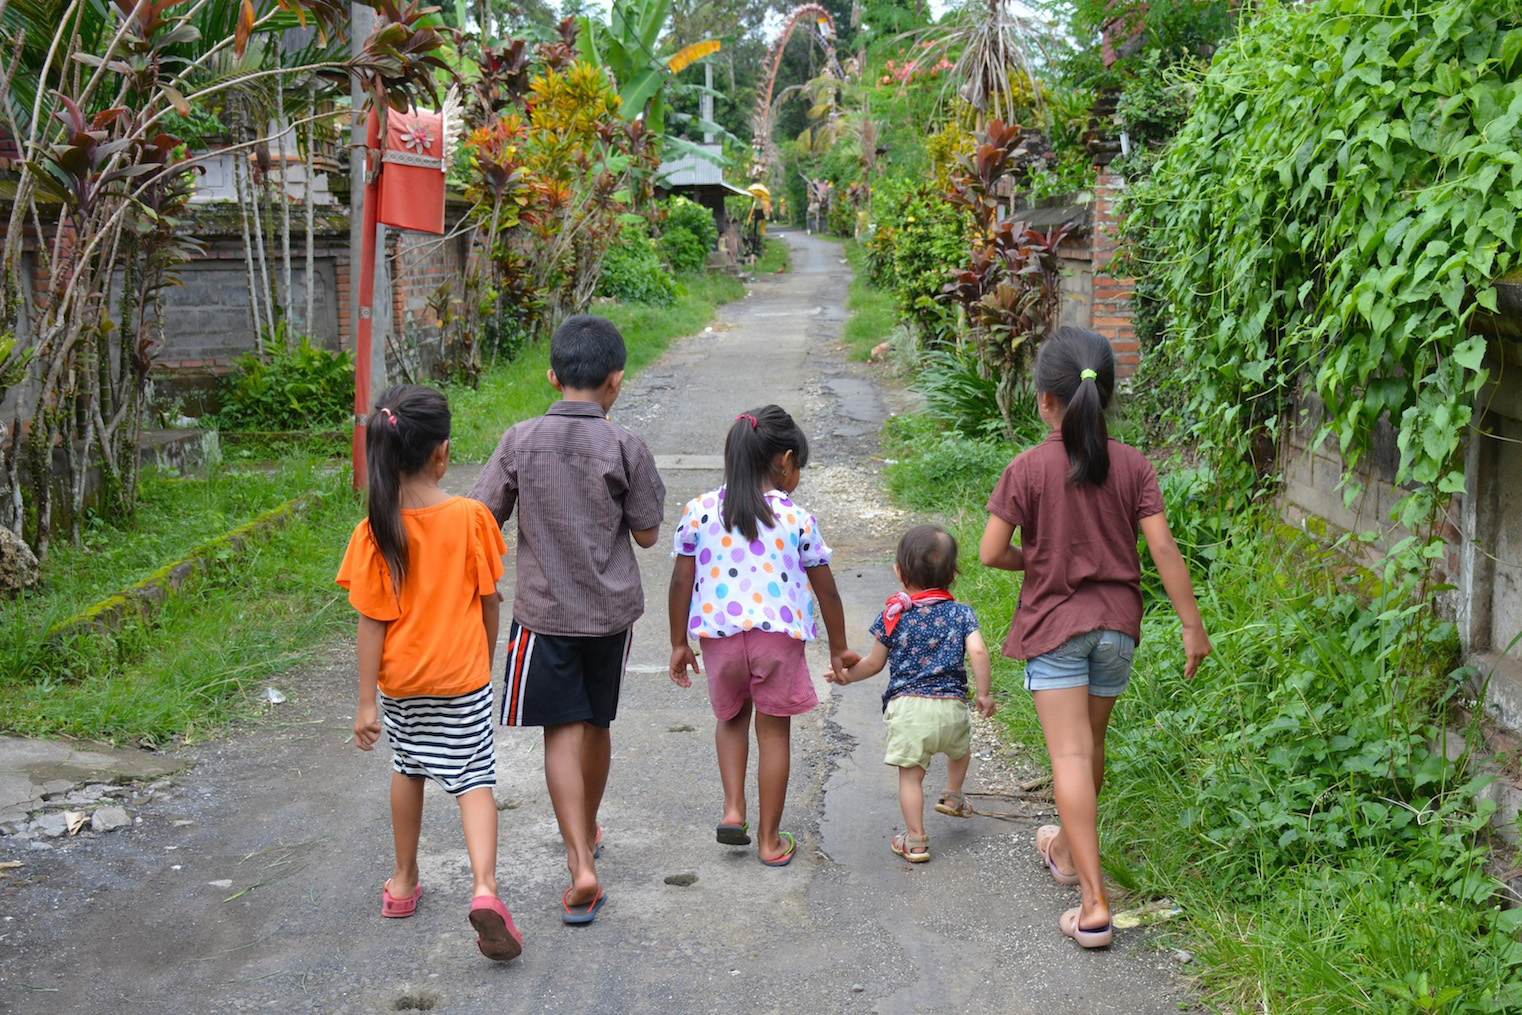 05.Matka Nomadka - podroz z dzieckiem - Indonezja